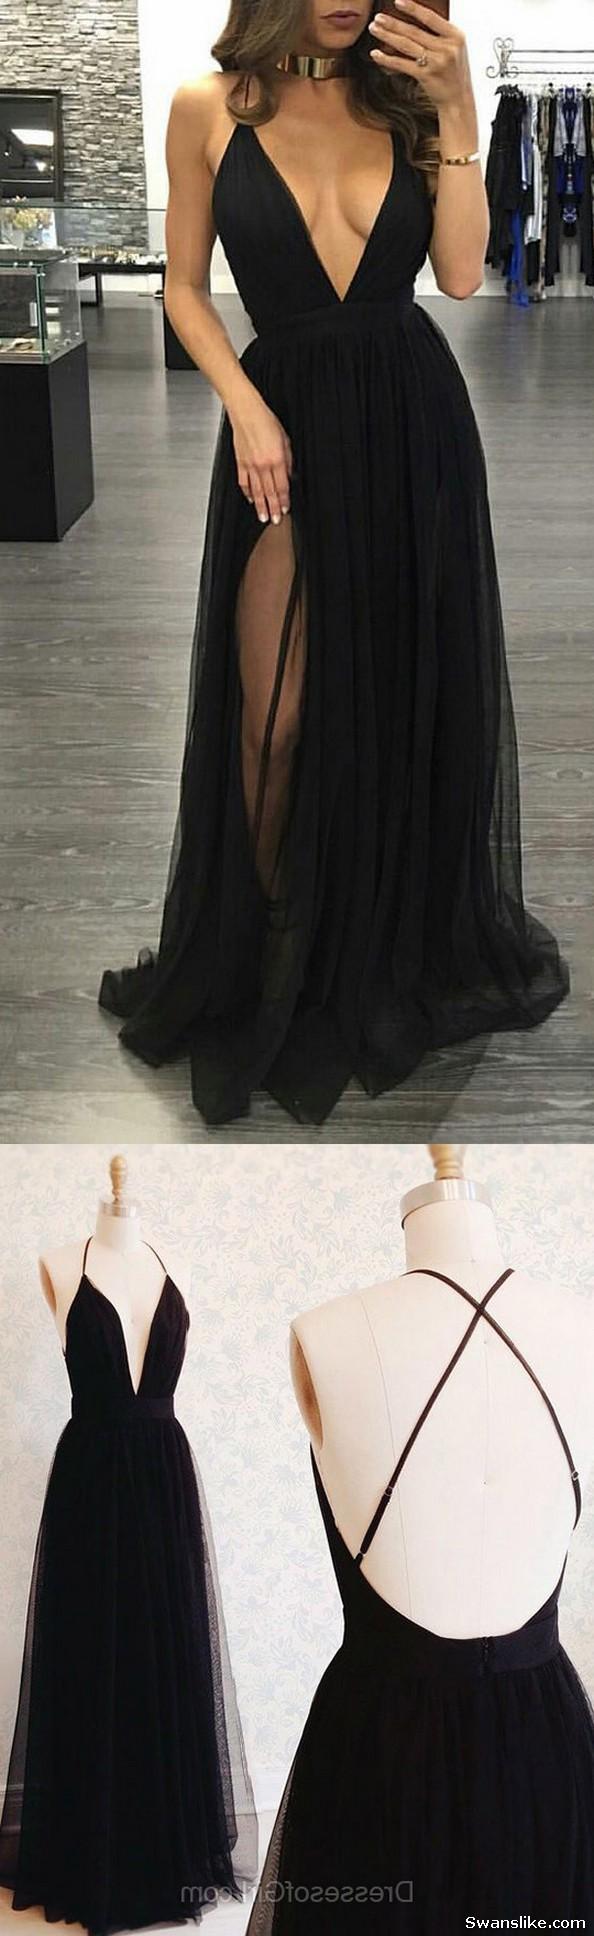 Night dresses fashion prom dress promdress eveningdress